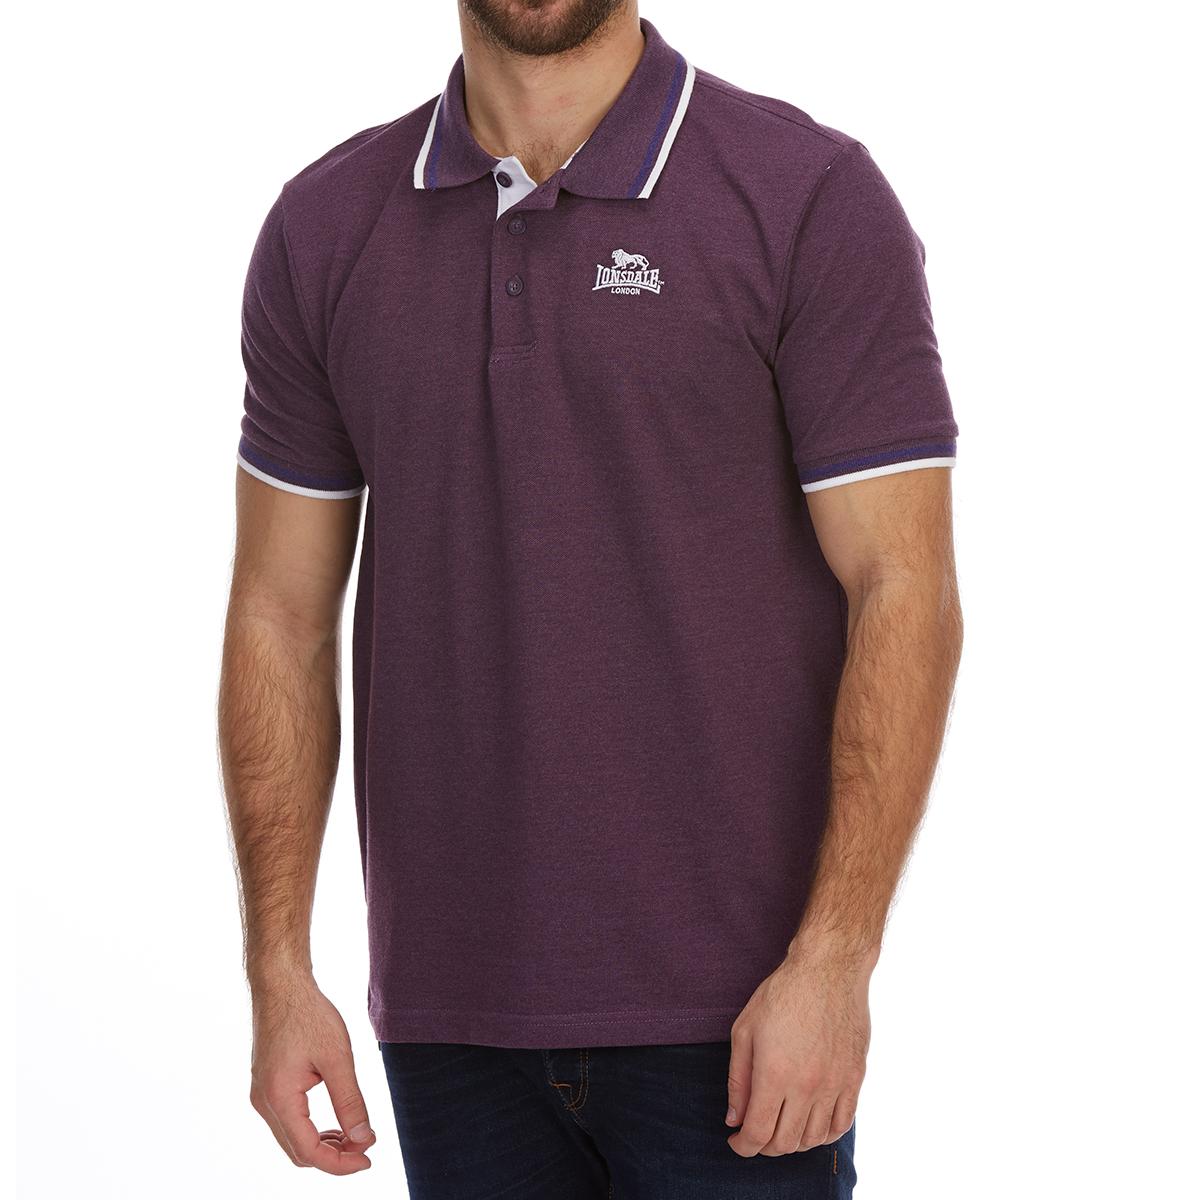 Lonsdale Men's Short-Sleeve Tipped Polo Shirt - Purple, 4XL